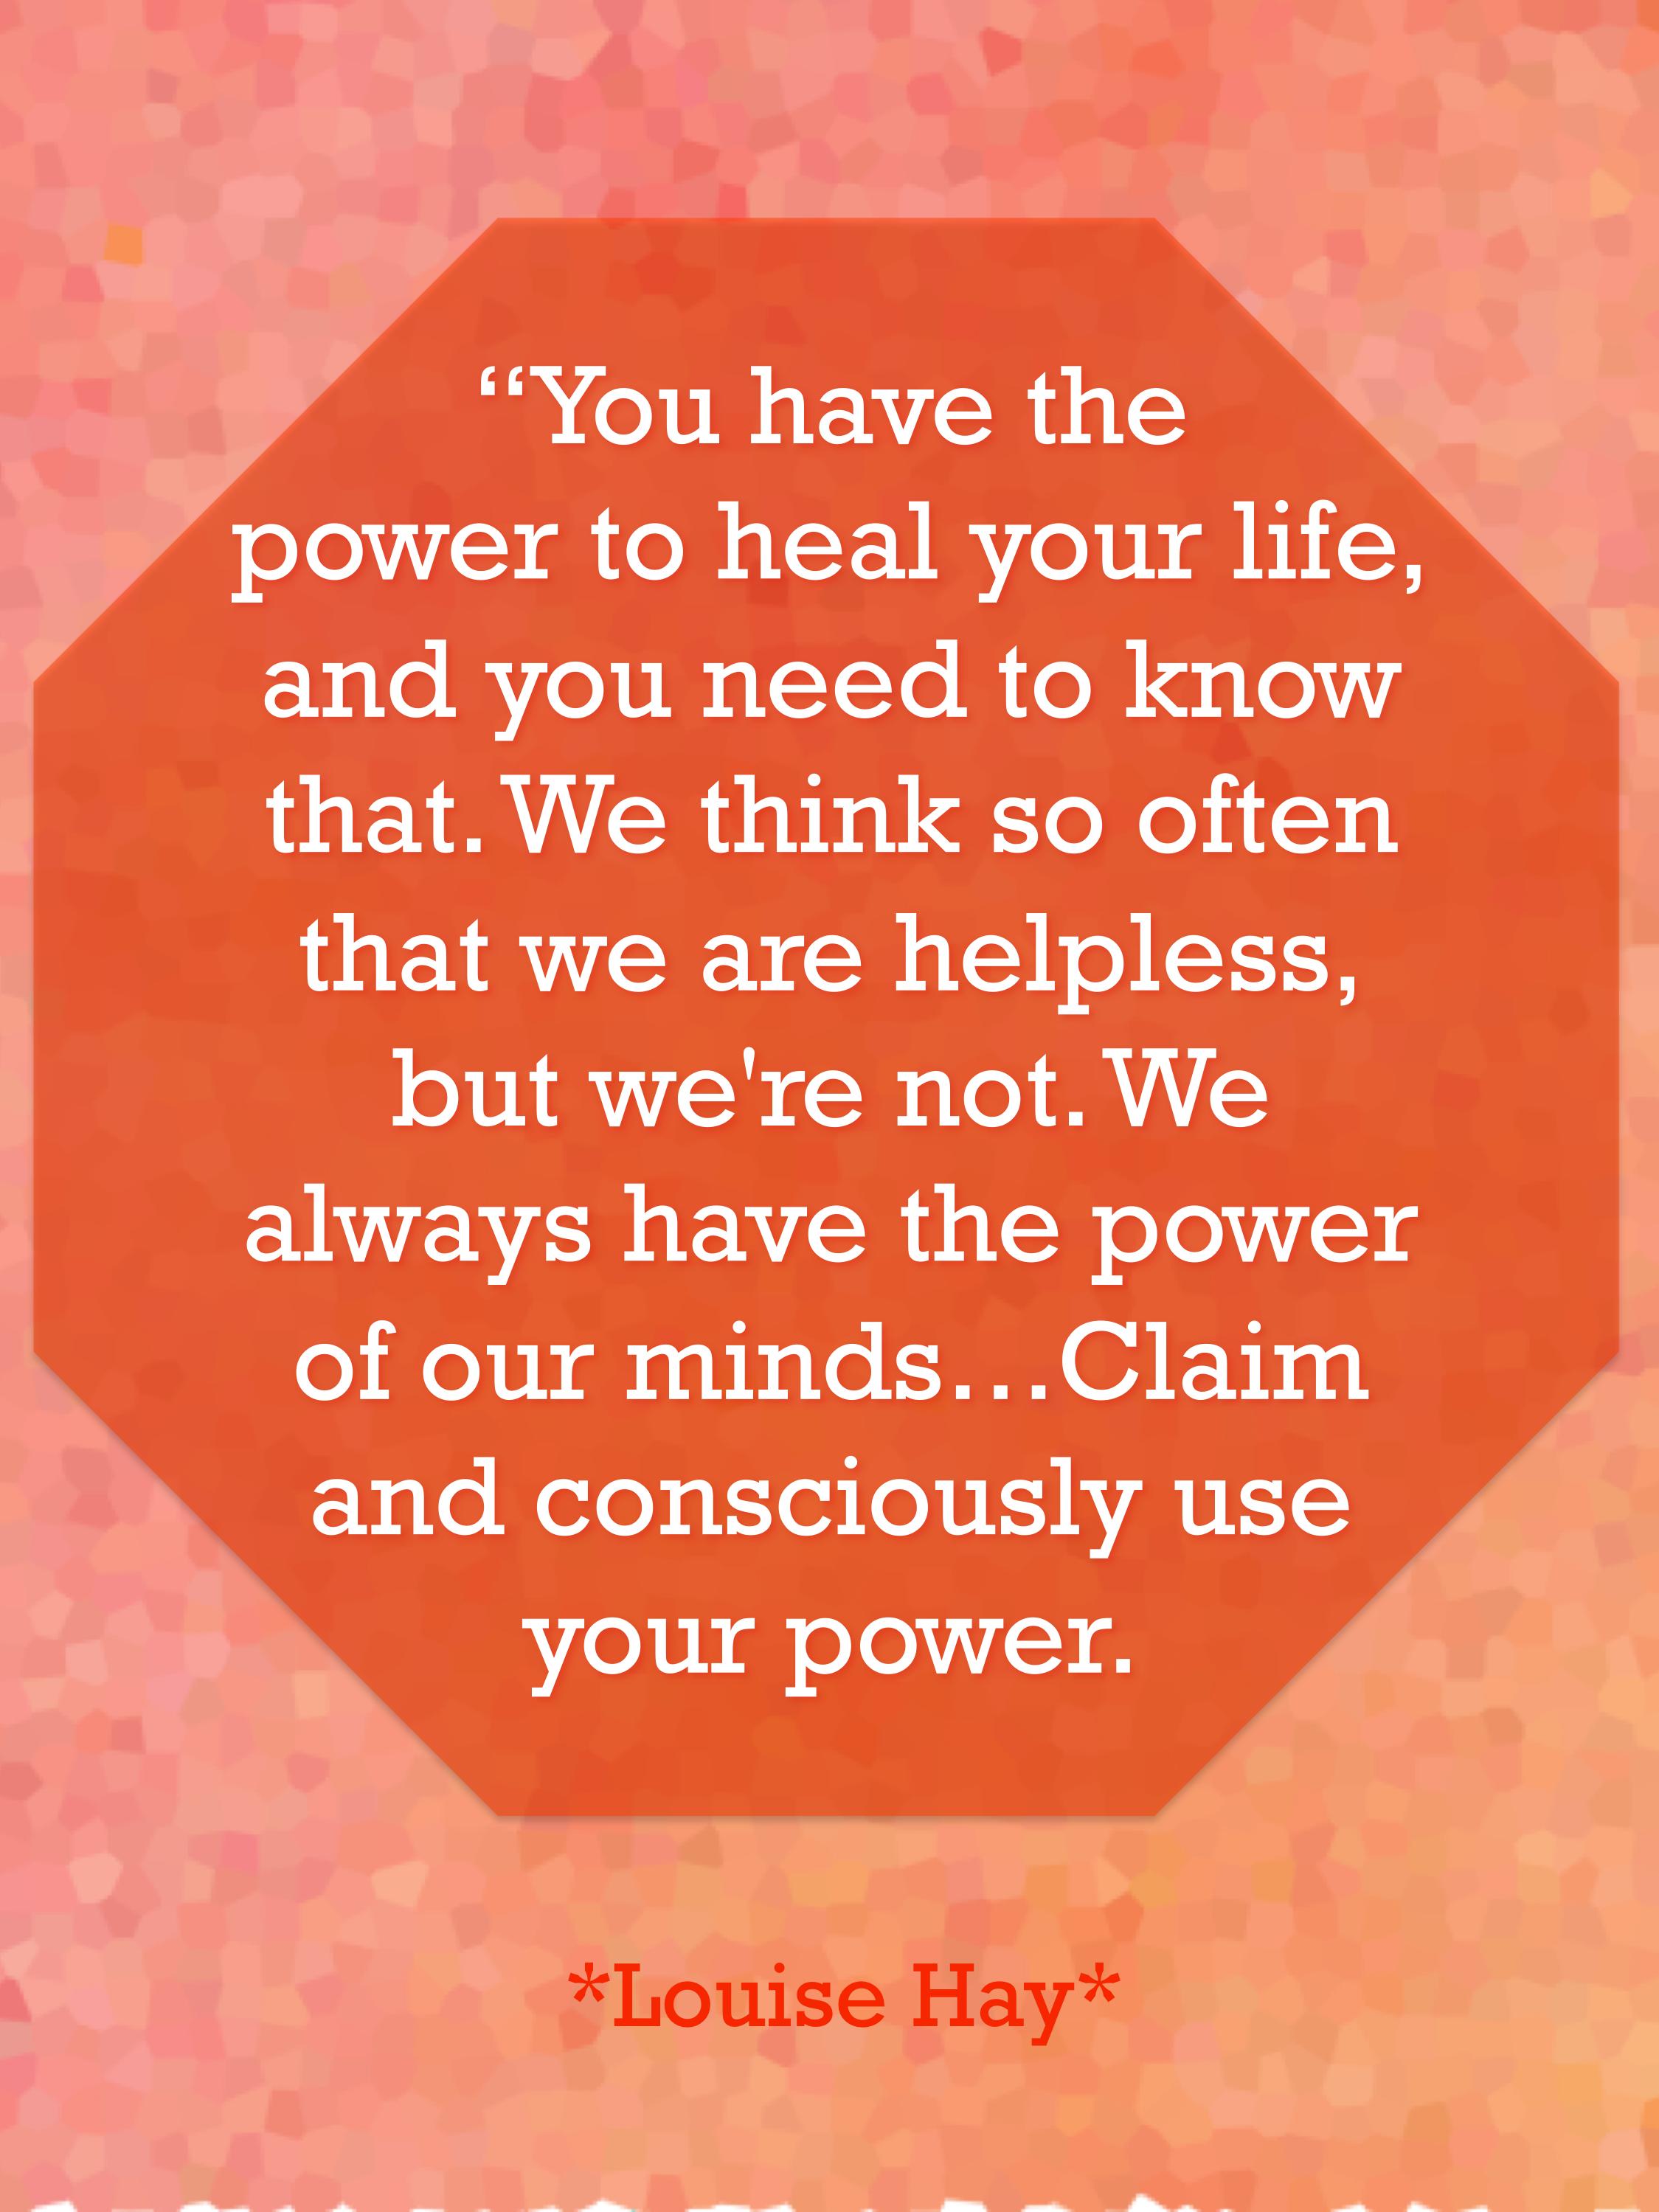 Louise Hay Quotes Healing Facebook thumbnail